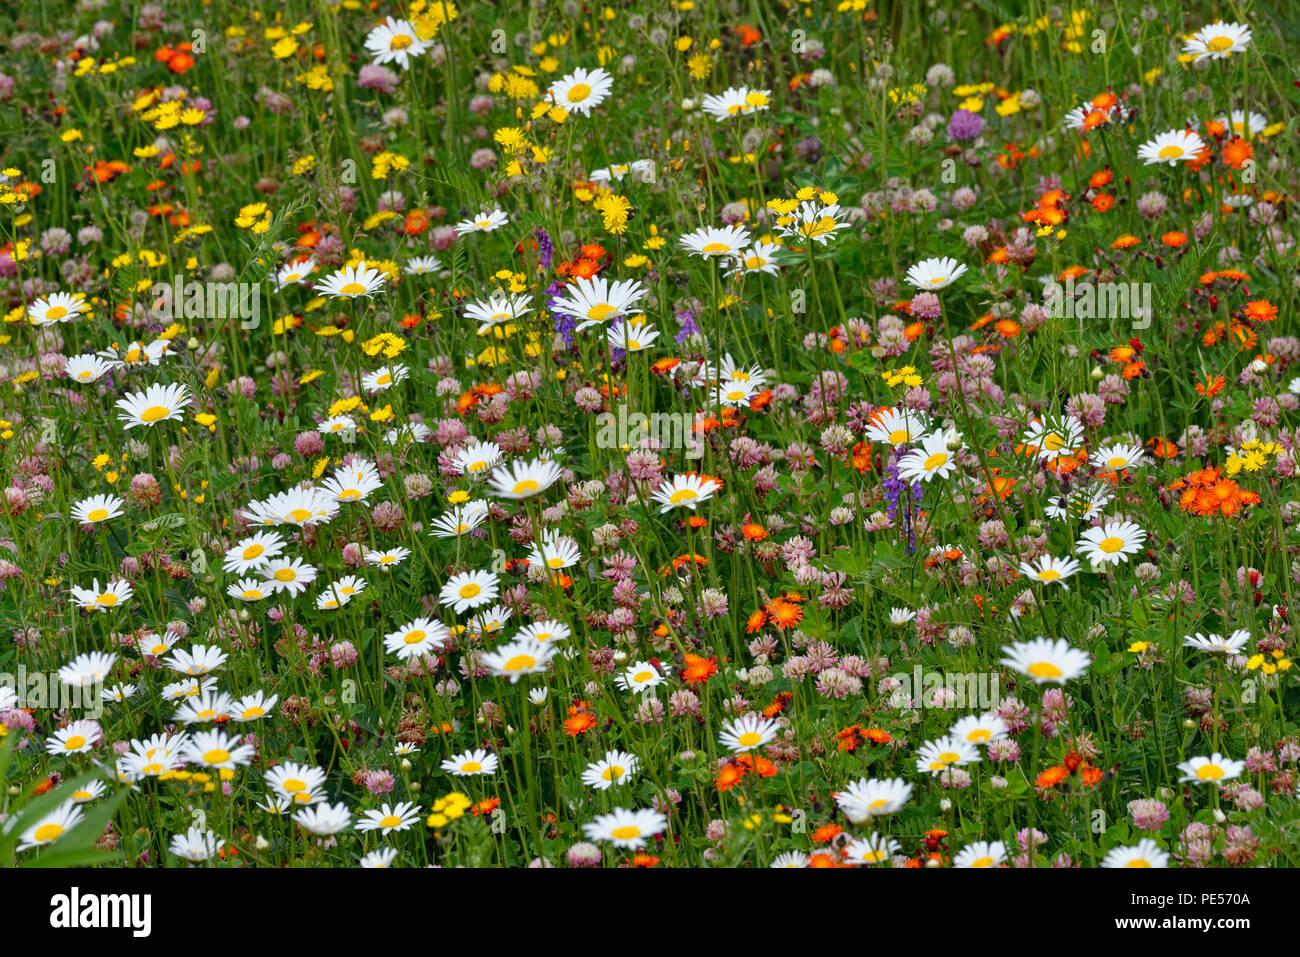 Roadside daisies and yellow hawkweed, Greater Sudbury, Ontario, Canada - Stock Image